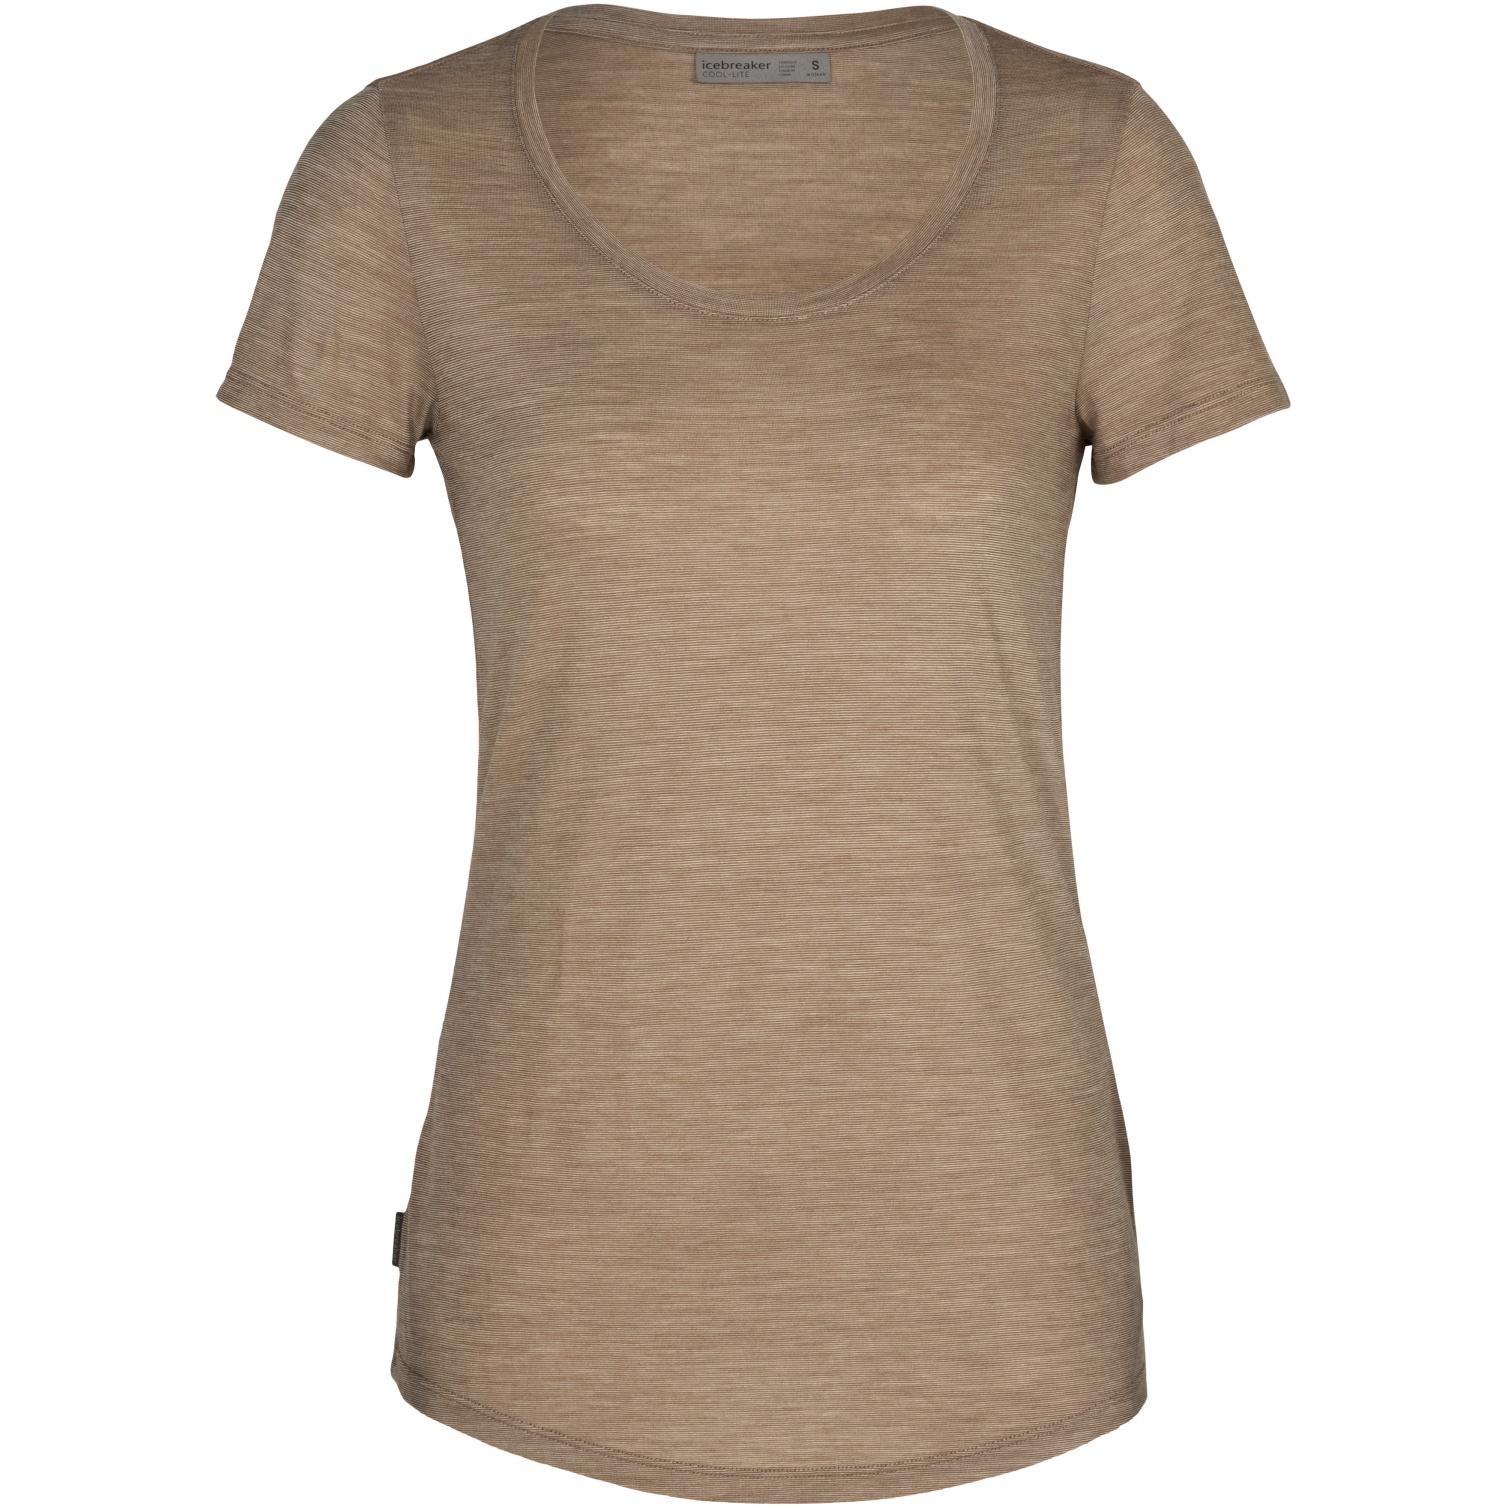 Produktbild von Icebreaker Sphere Scoop Damen T-Shirt - Flint